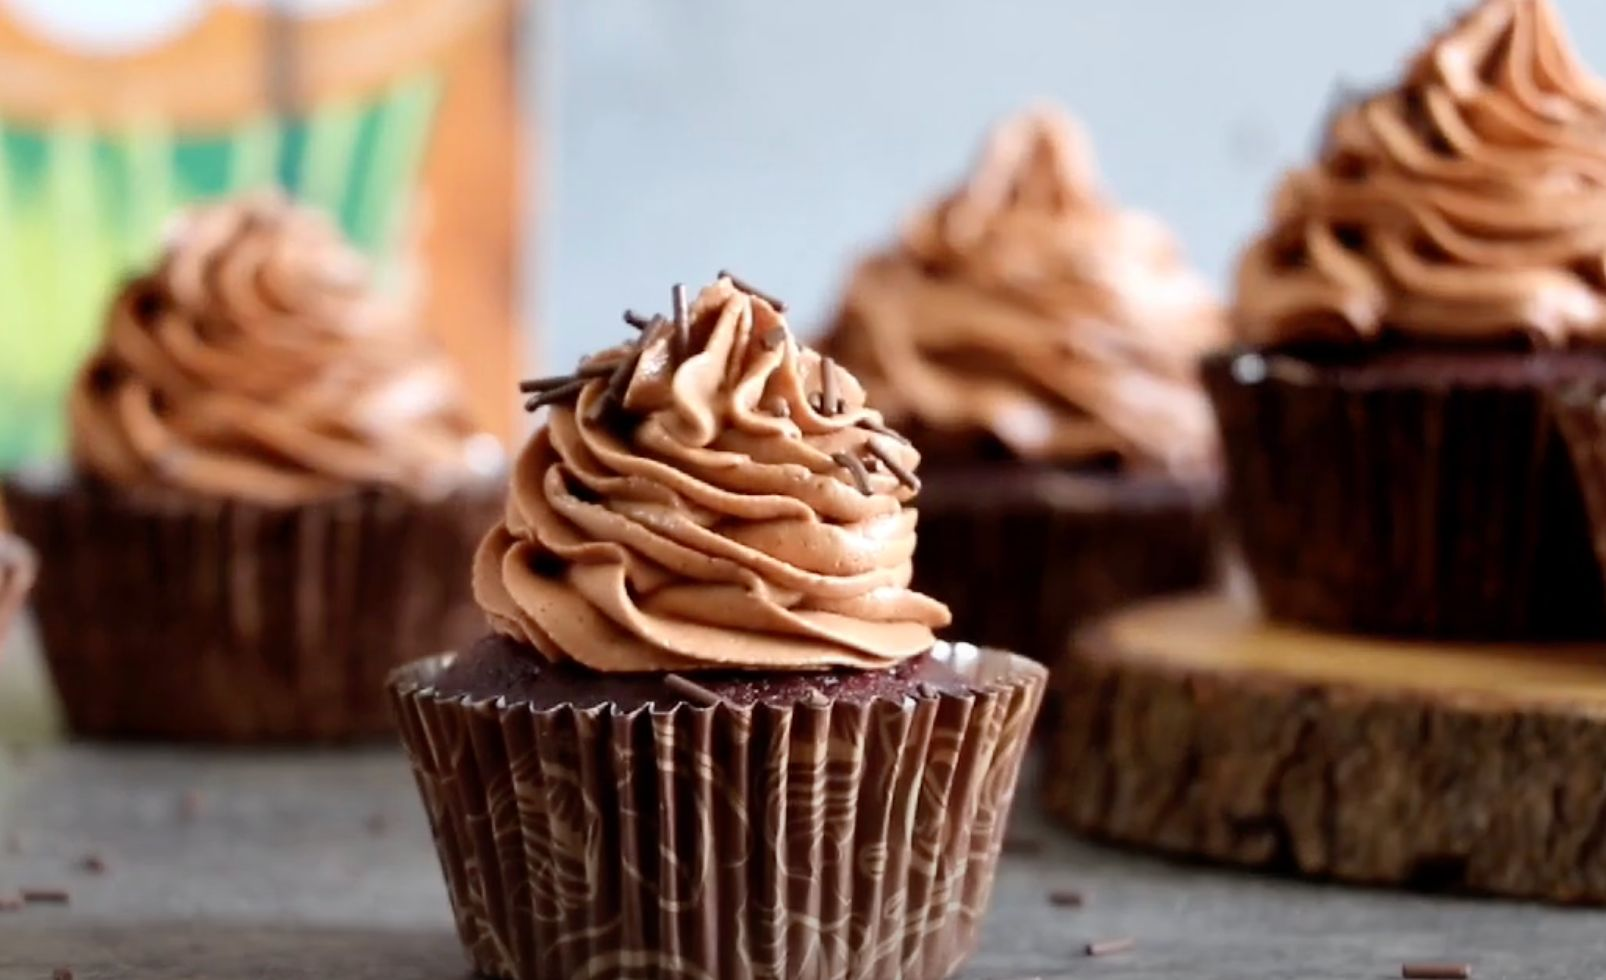 Chocolate Zucchini Cupcakes with Chocolate Cream Cheese Frosting Recipe